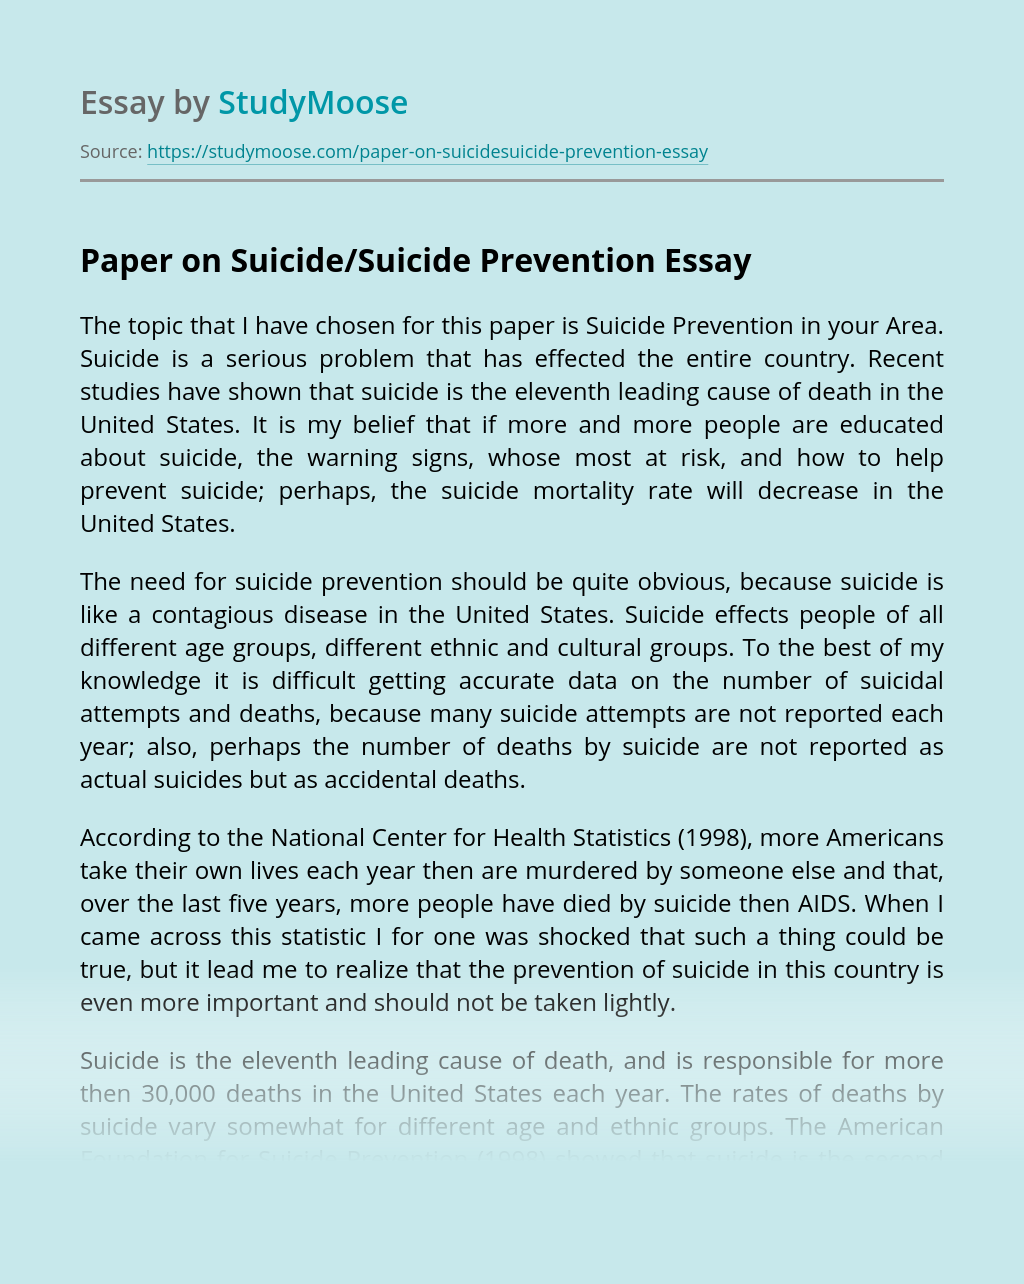 Paper on Suicide/Suicide Prevention